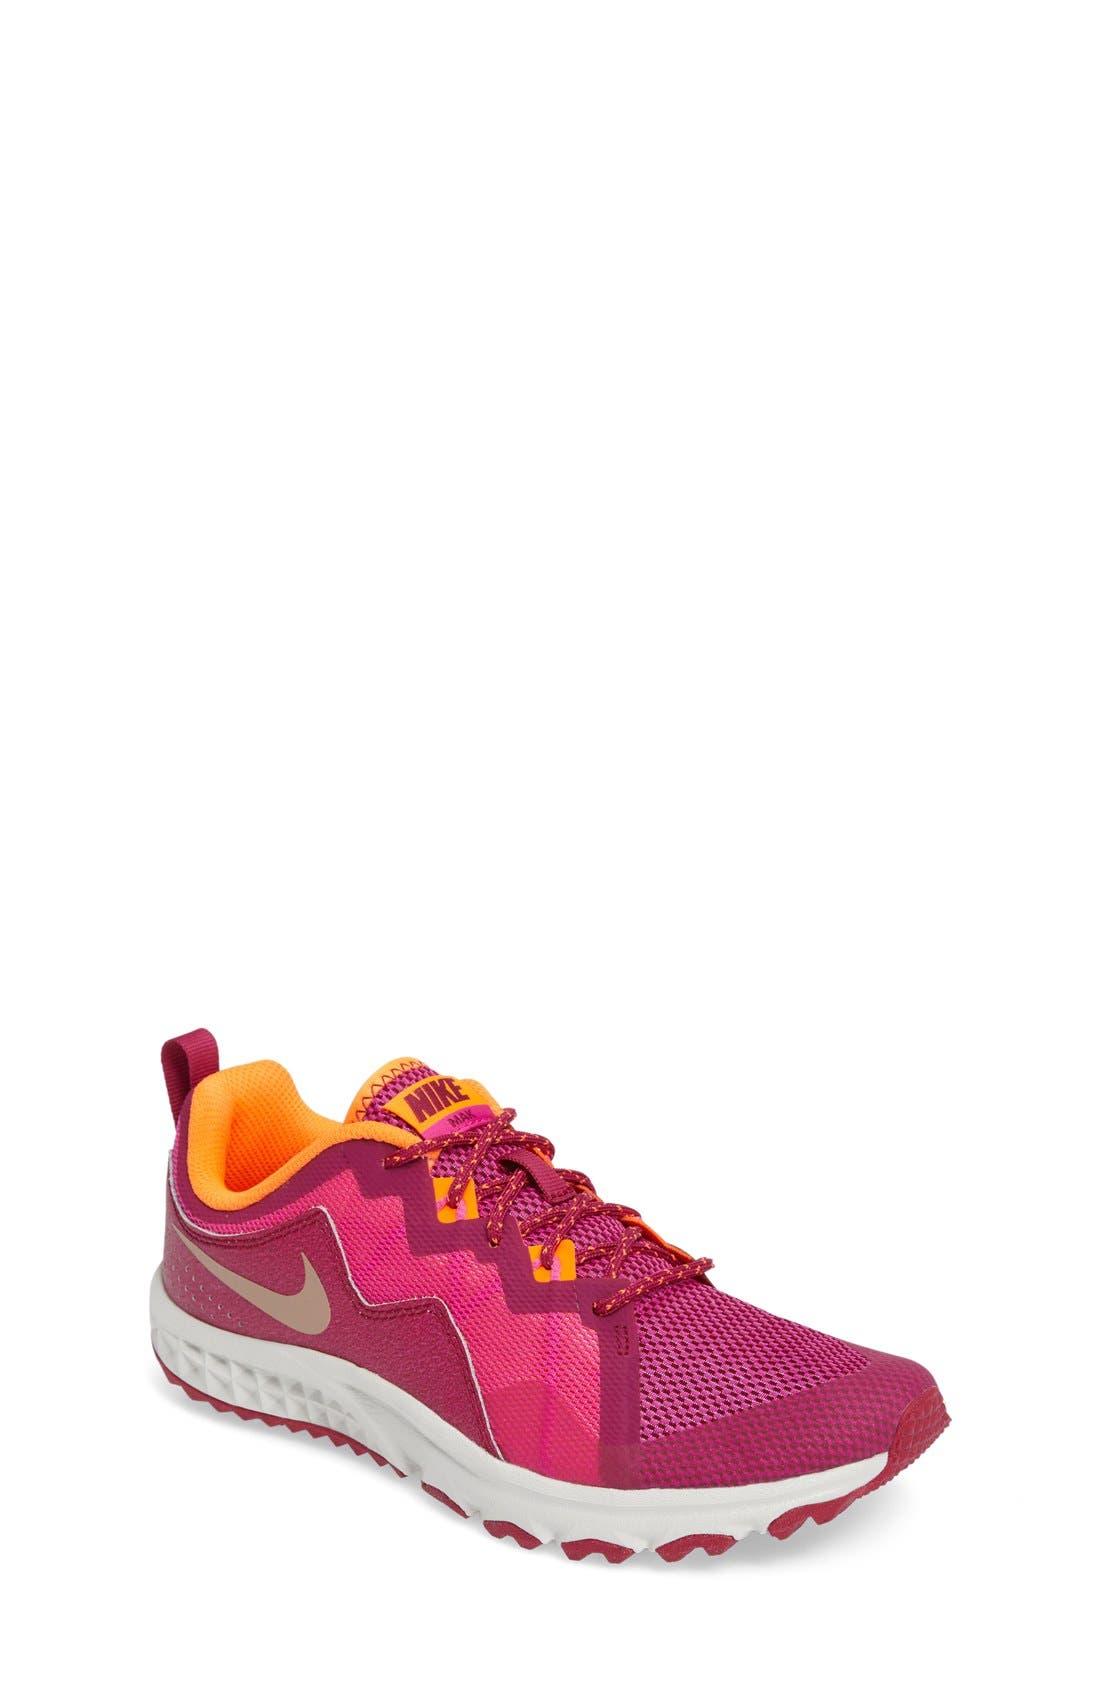 NIKE 'Mak' Sneaker